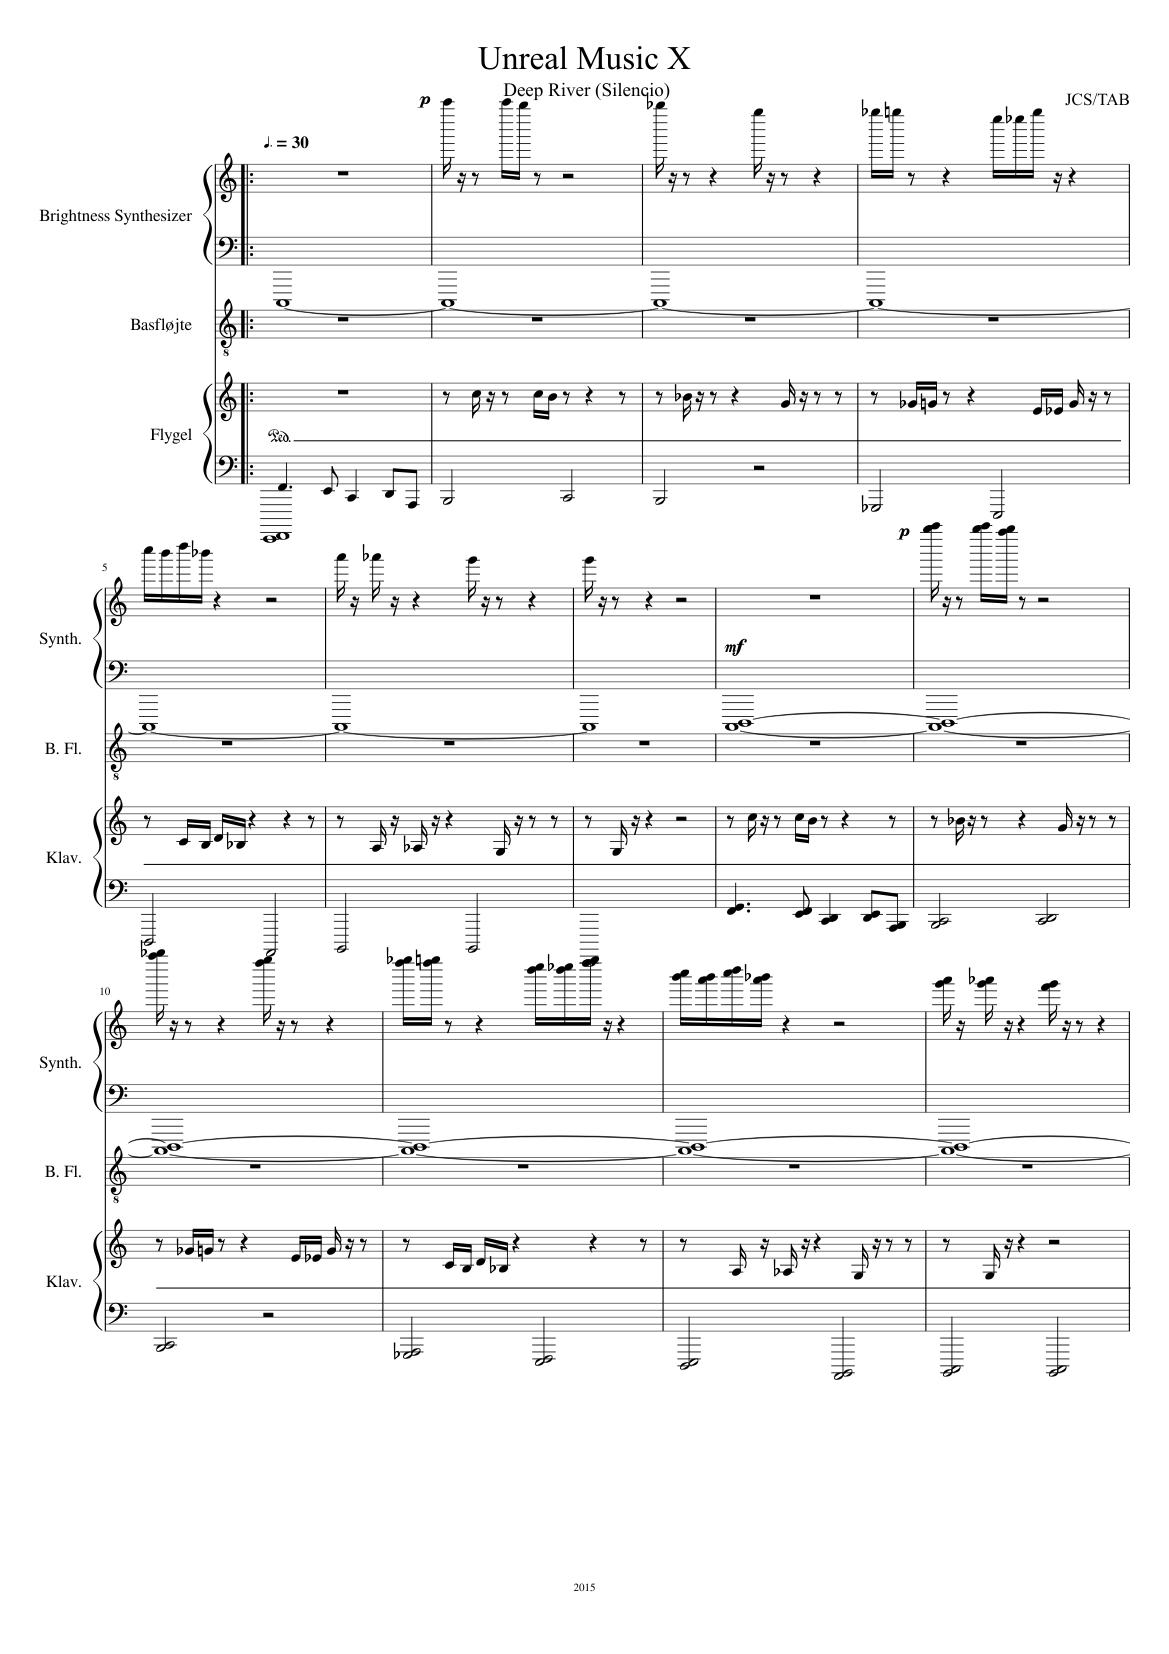 Unreal Music X - Deep River (Silencio) sheet music for Flute